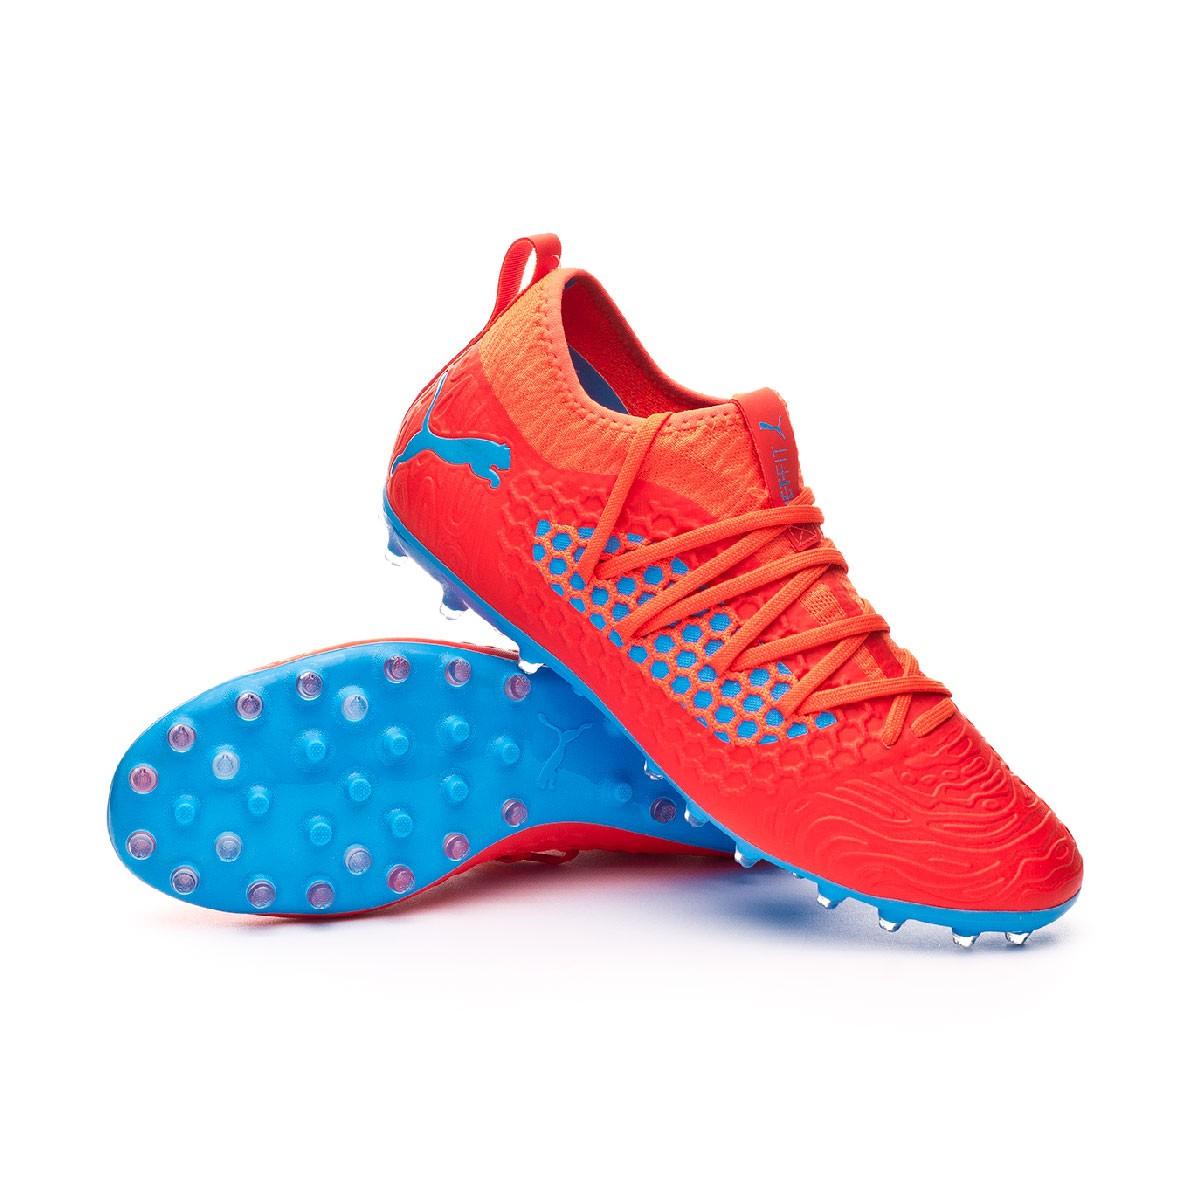 58bdfaf9a Football Boots Puma Future 19.3 Netfit MG Red blast-Bleu azur - Football  store Fútbol Emotion